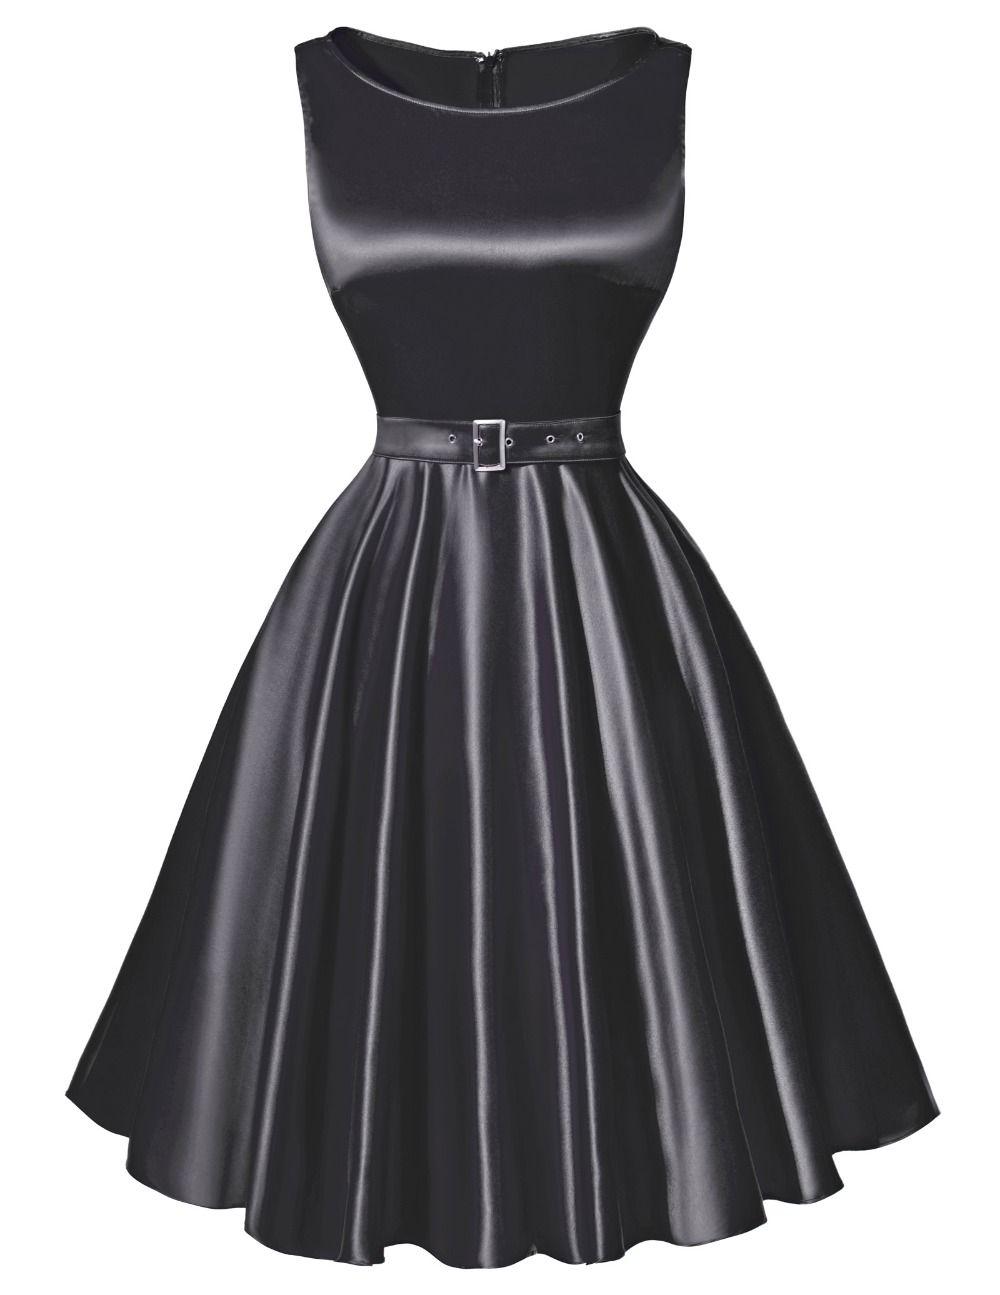 Grace karin long prom dresses satin black white red royal blue